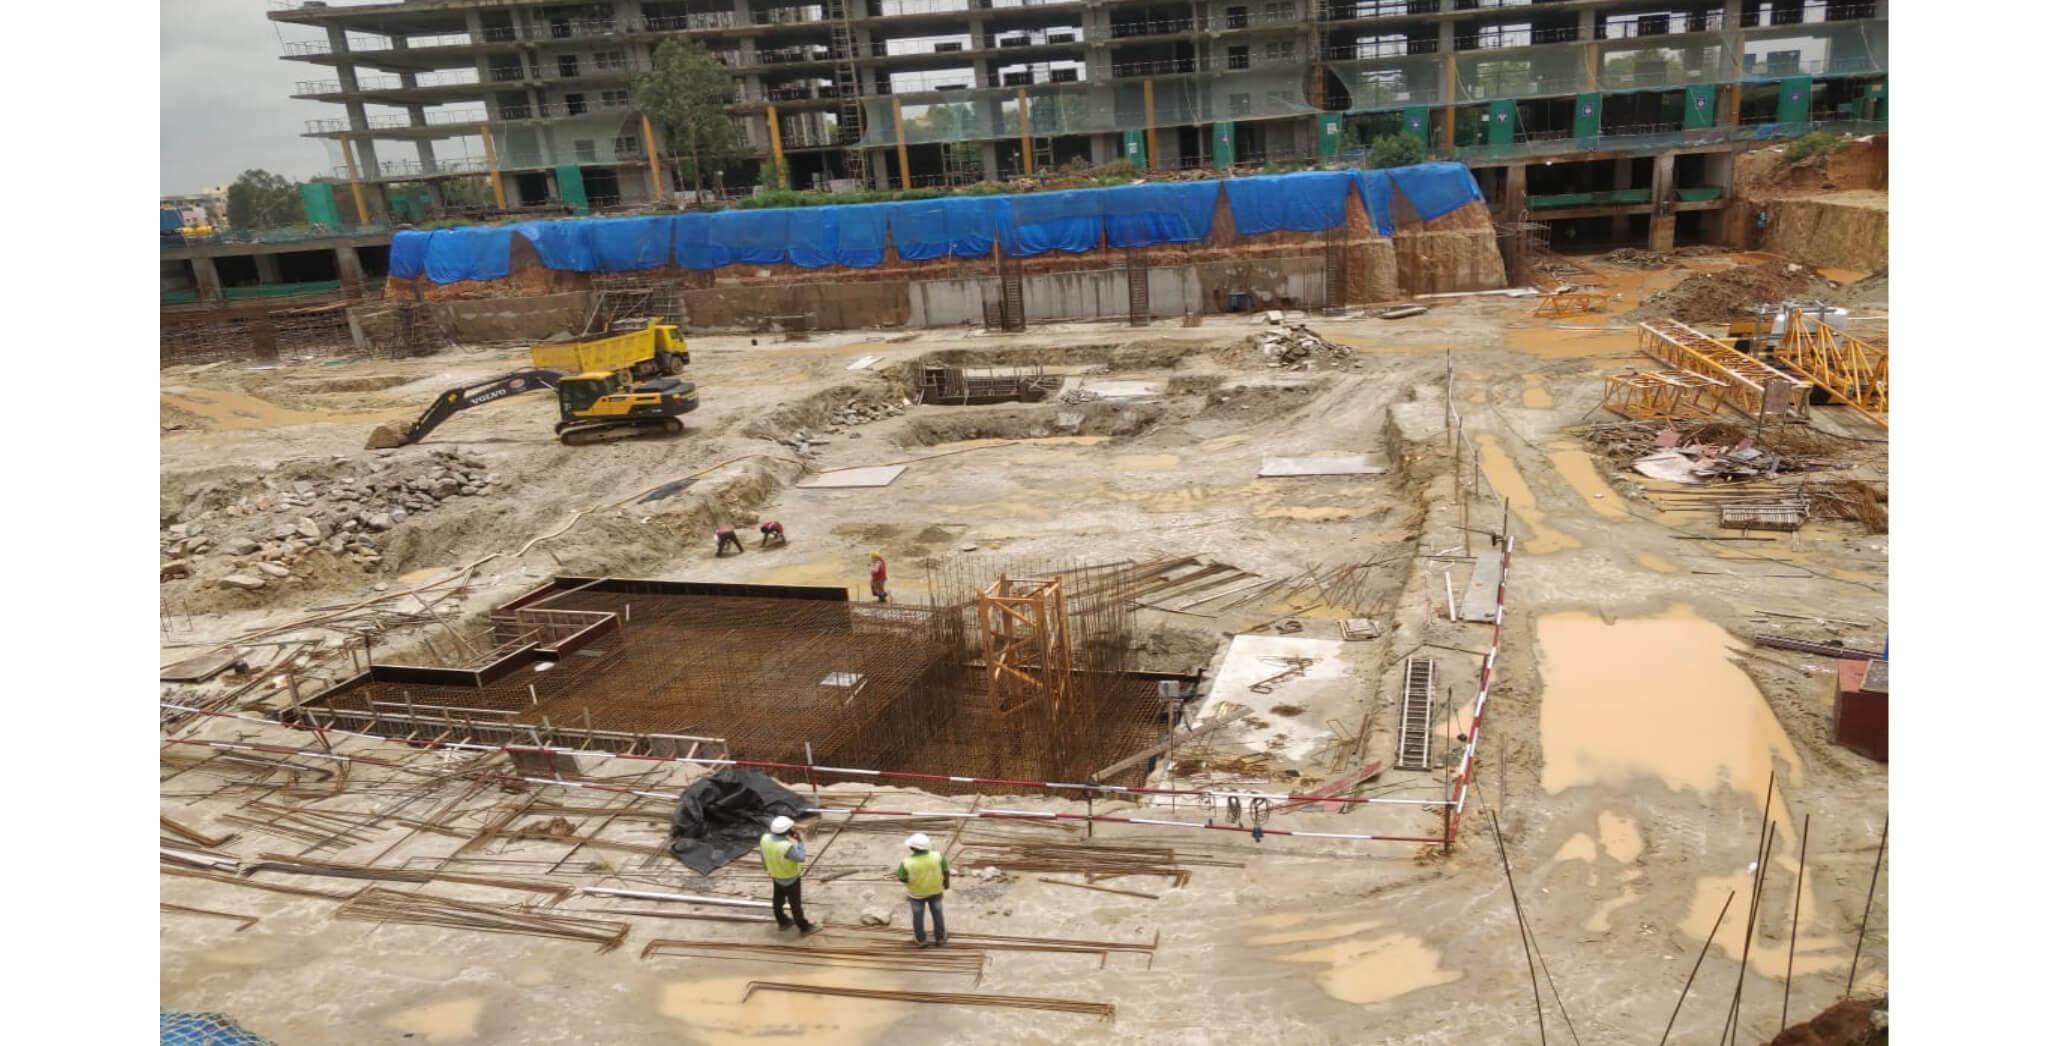 Aug 2021 - Paradise: Tower H, Raft/Footing work in progress